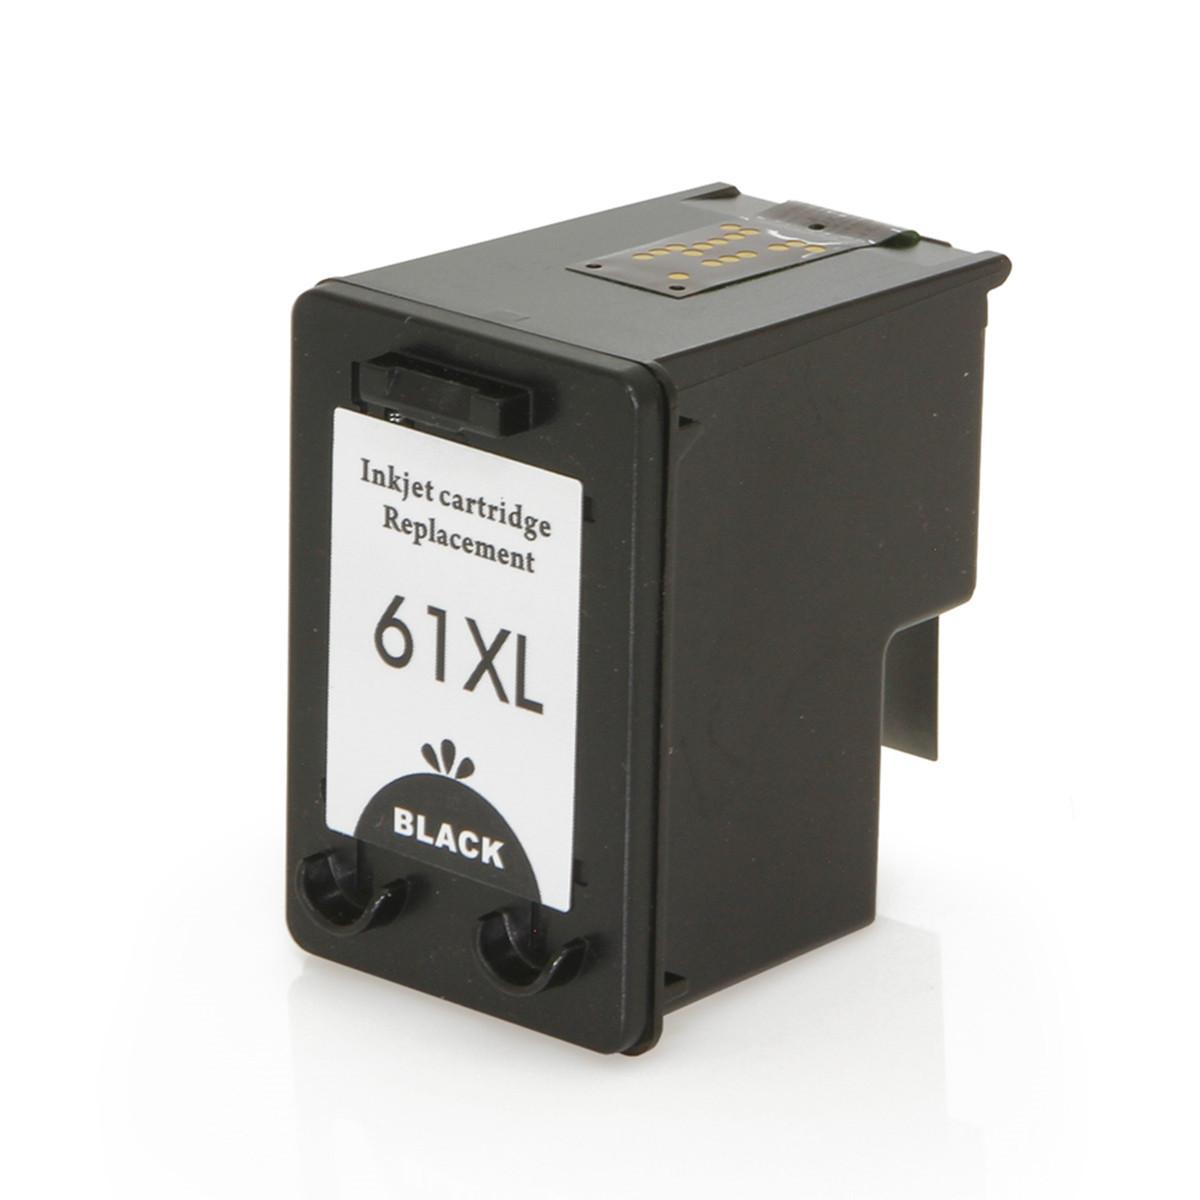 Cartucho de Tinta Compatível com HP 61XL 61 Preto | Deskjet 1000 Deskjet 3000 Deskjet 2000 12ml